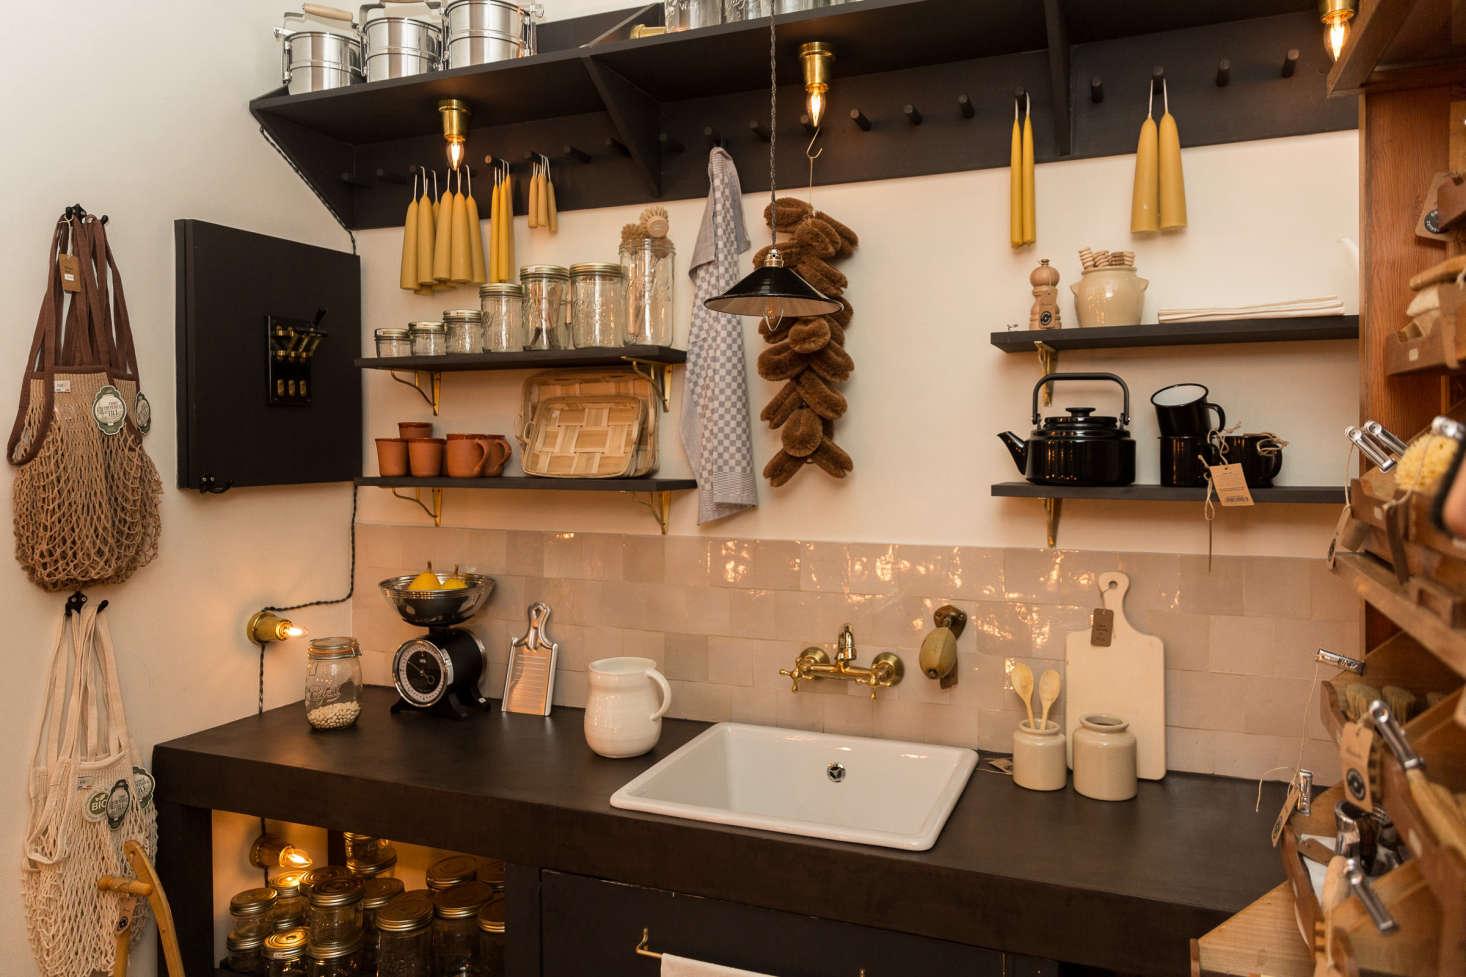 Kitchen accessories are arrayed around a concrete sink counter. The zellige backsplash tiles and brass bridge faucet are both Moroccan. The under-shelf brass sconces(€45) are a González &González design.